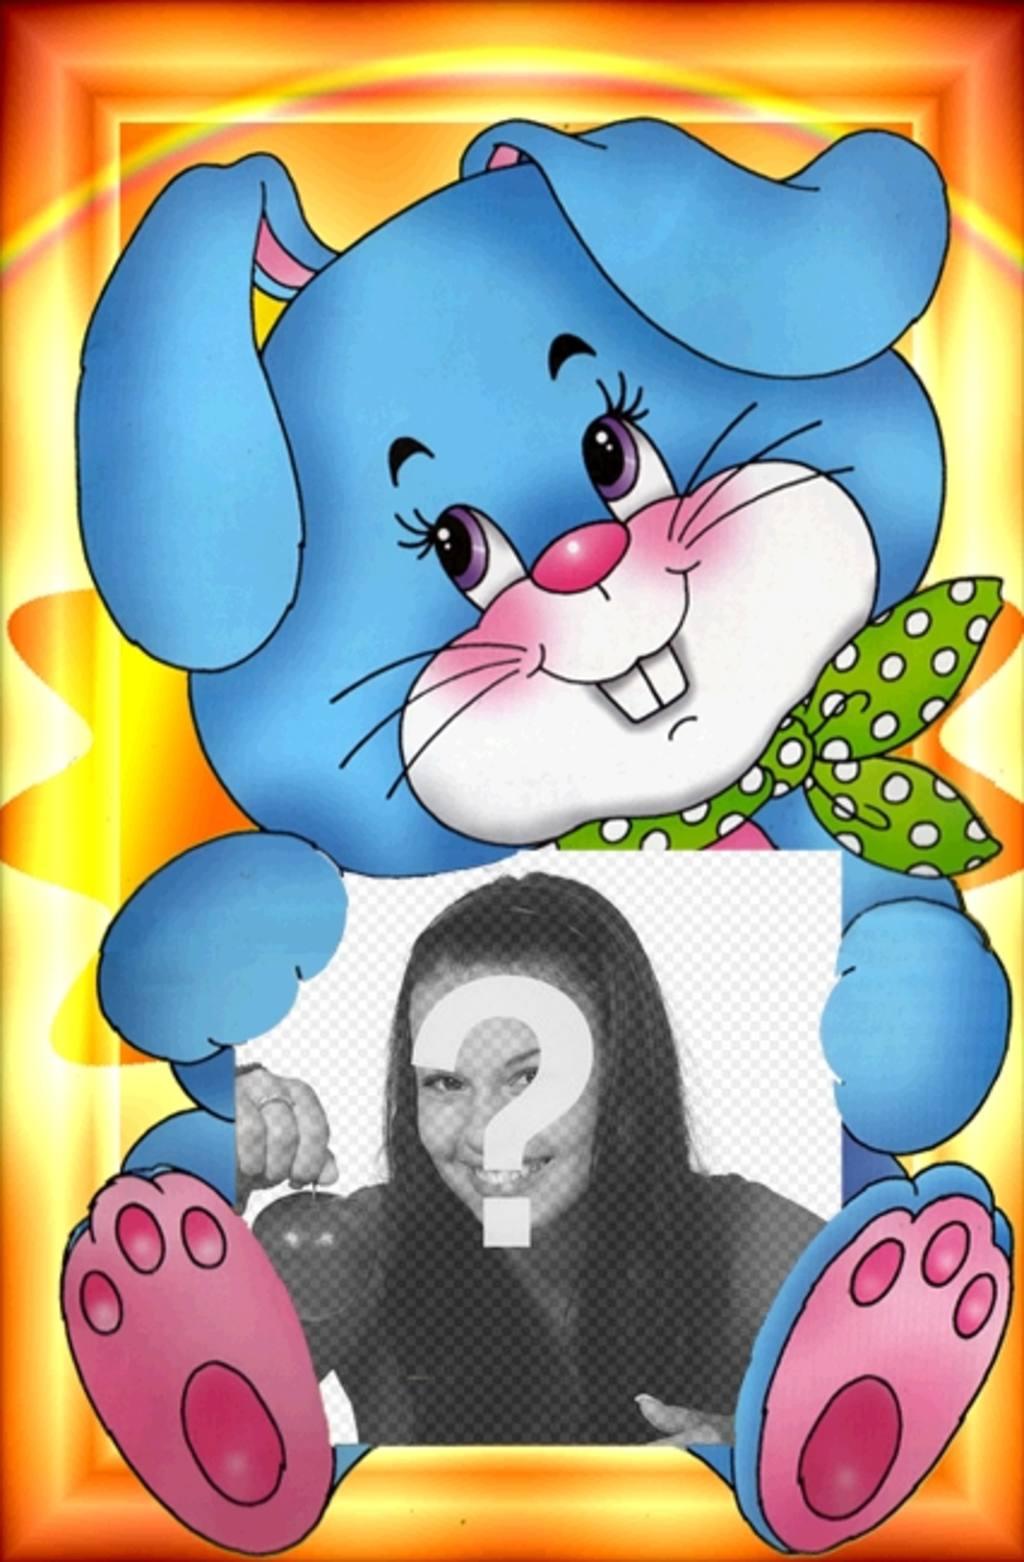 fotografia sujeta un dibujo adorable un conejo azul un panuelo verde guarda o envia imagen gratuitamente